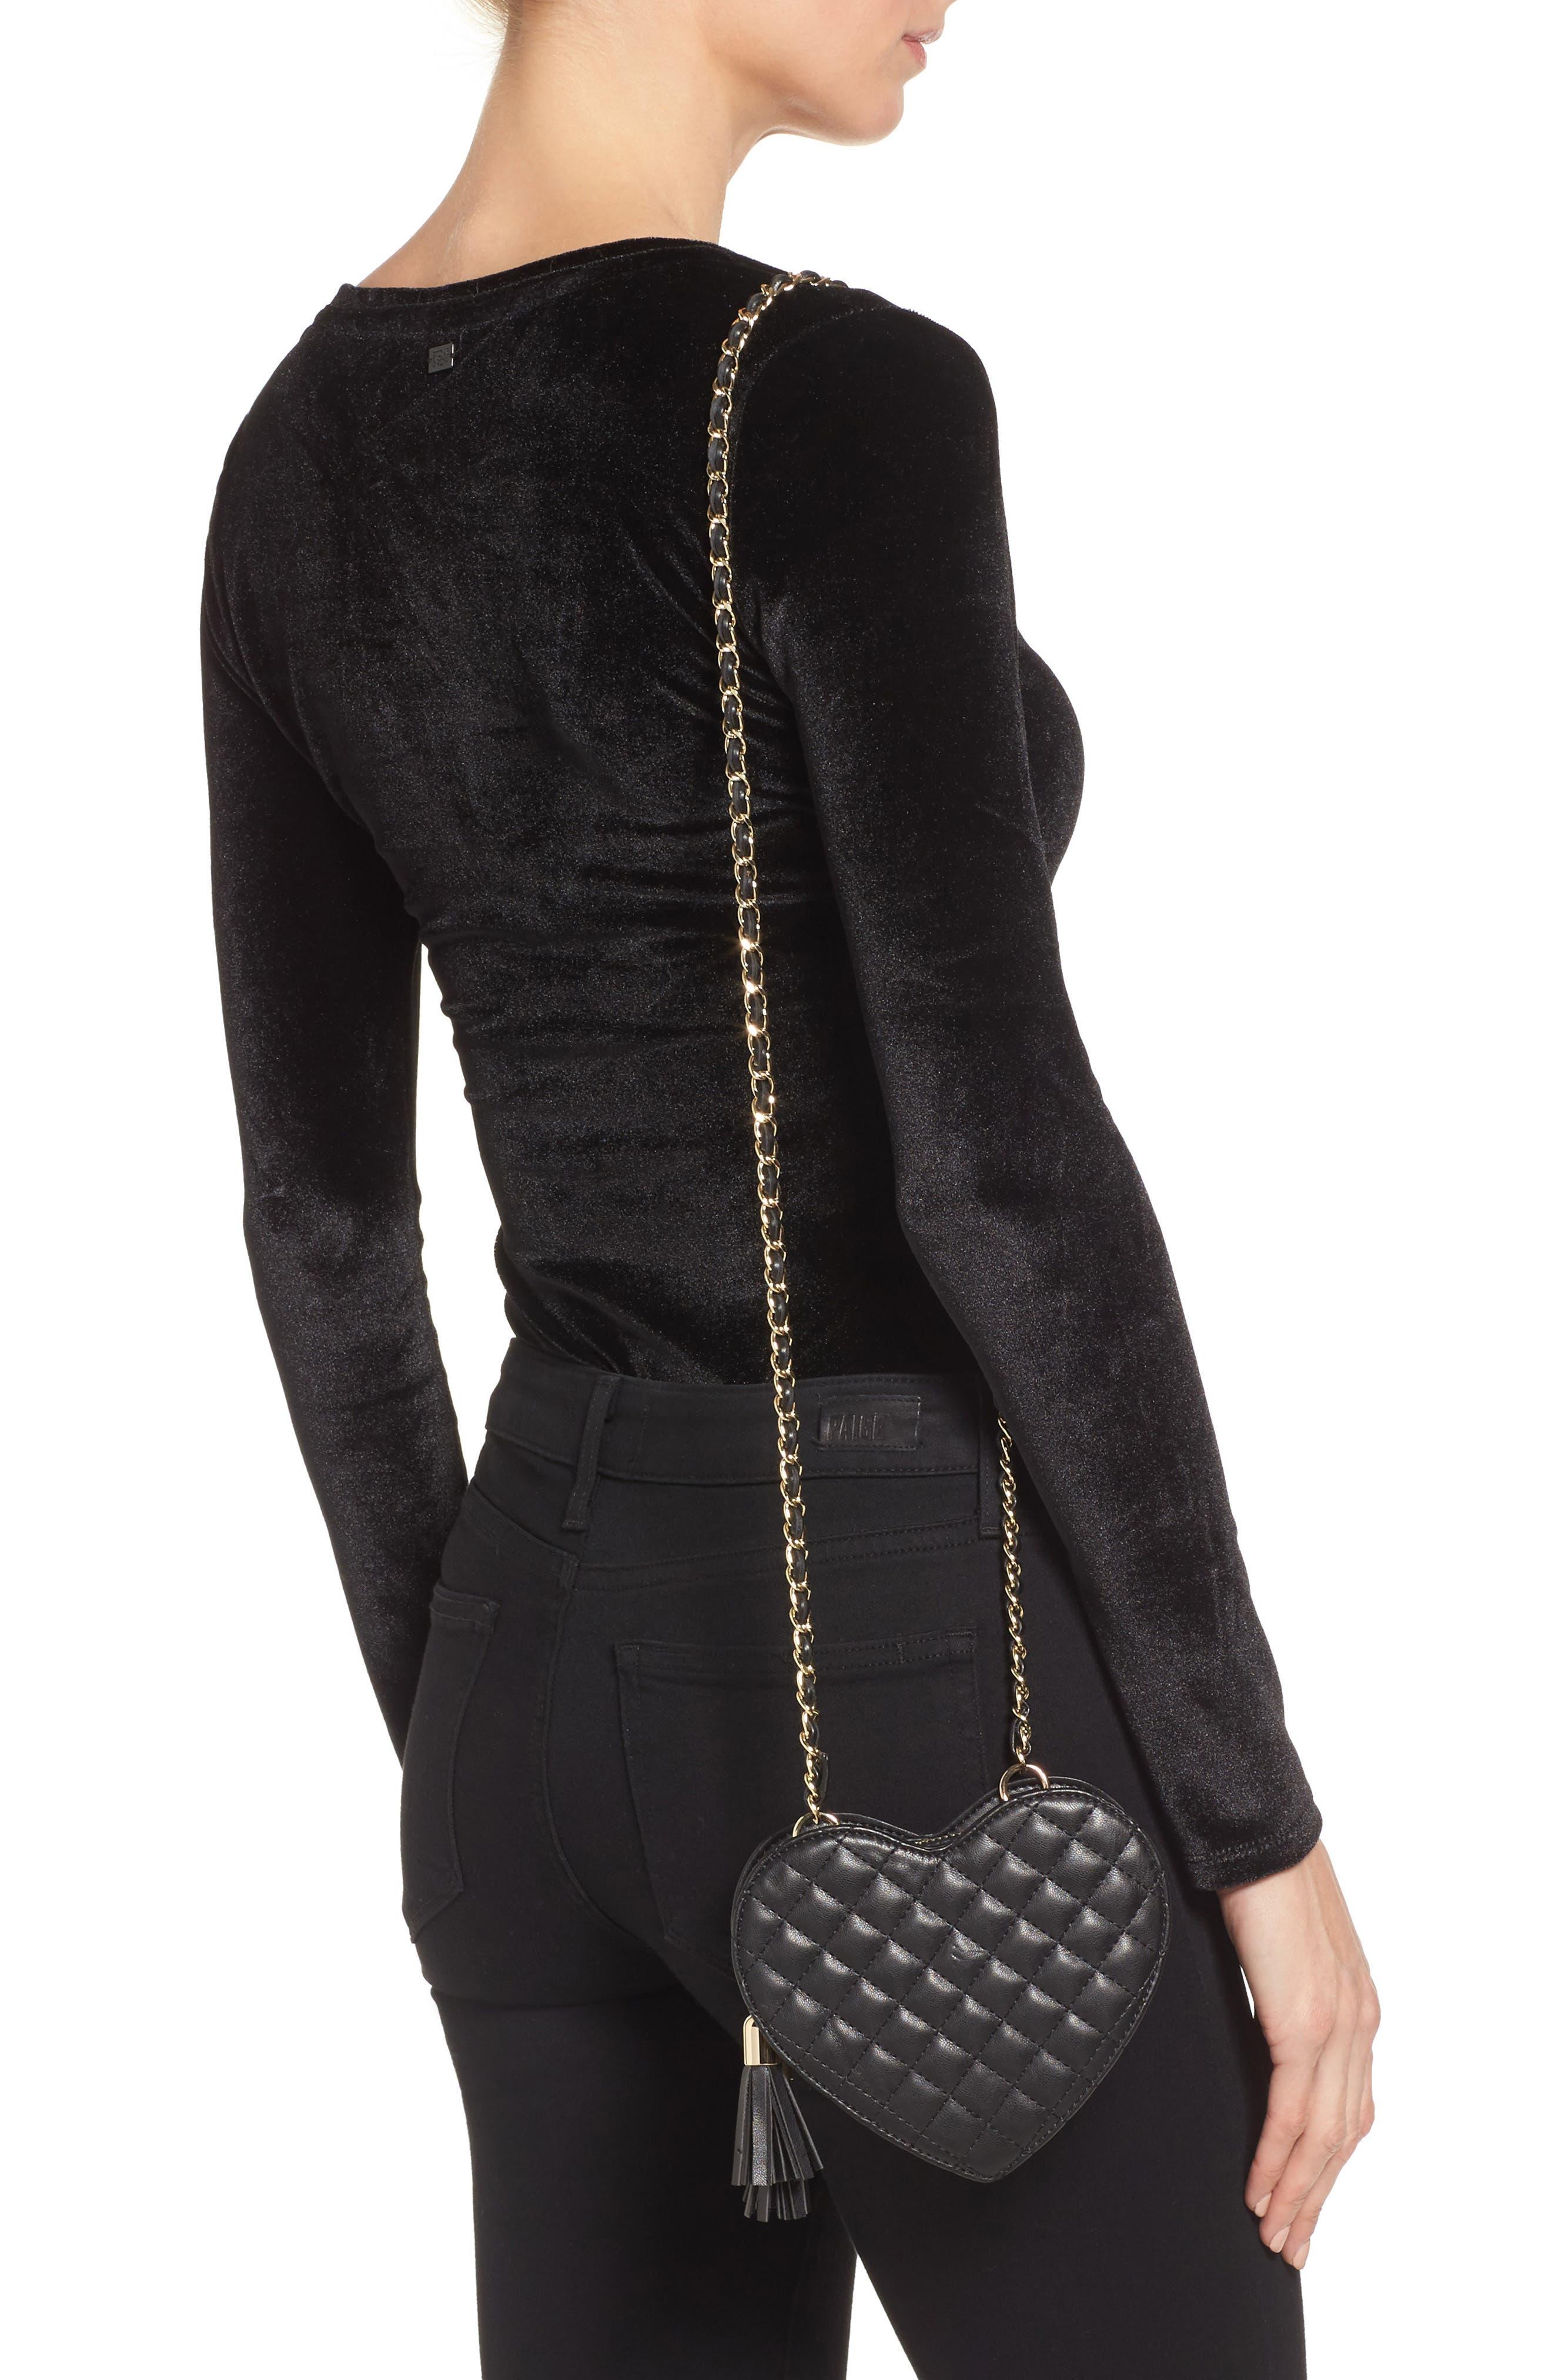 Mali + Lili Quilted Heart Vegan Leather Crossbody Bag,                             Alternate thumbnail 2, color,                             Black